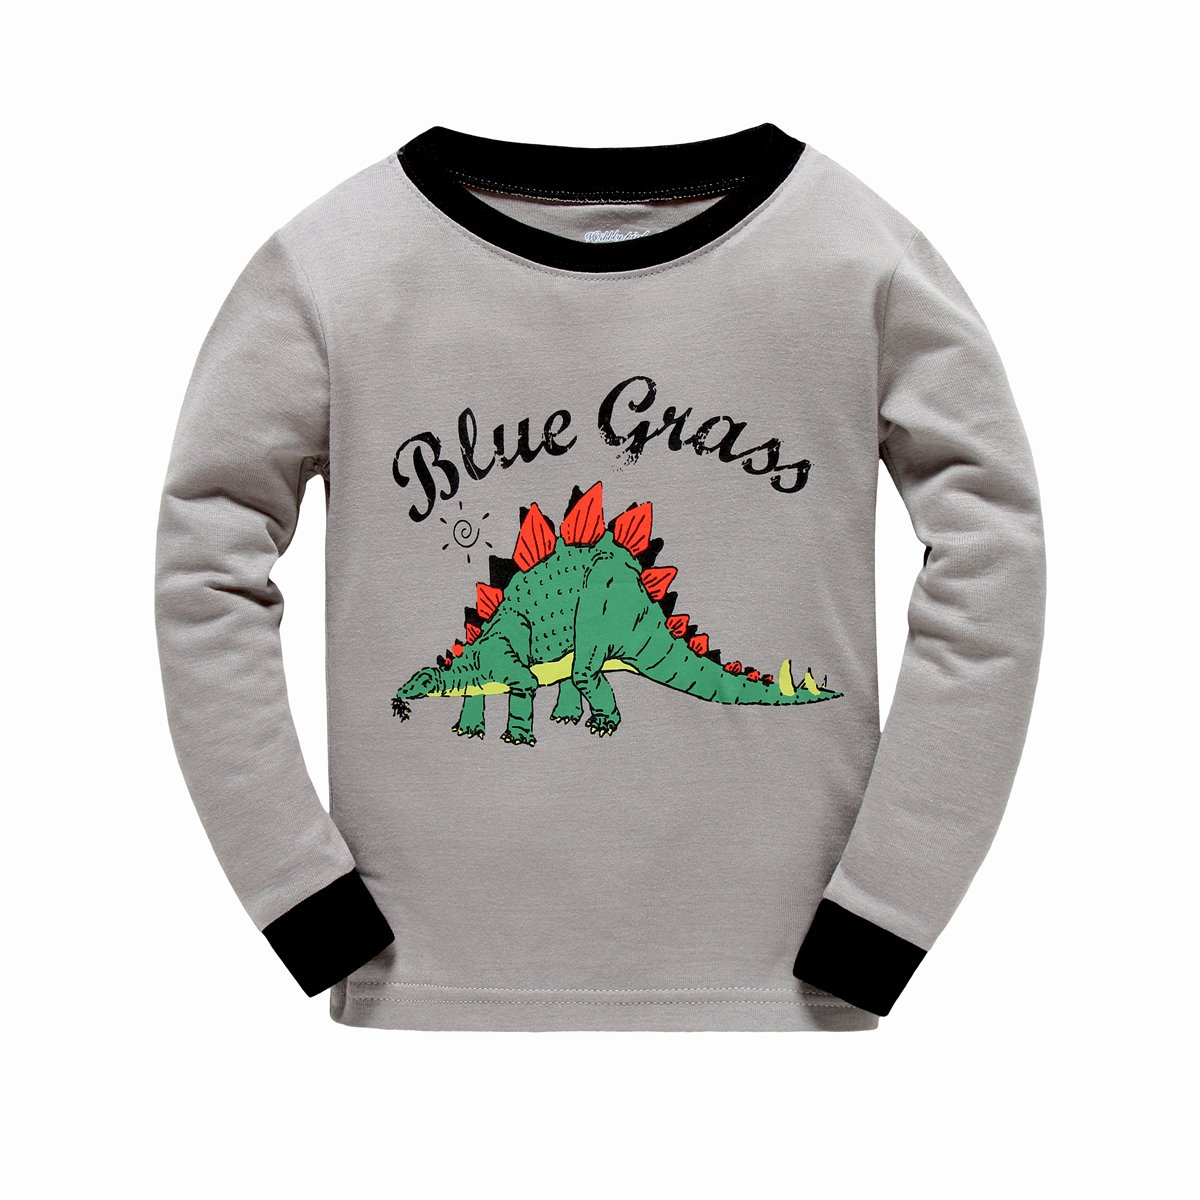 BABSUE Toddler Boys Dinosaur T-Shirt Long Sleeve Sweatshirts Cotton Pullover Crewneck Cartoon Tops Tees Kids 1-8T